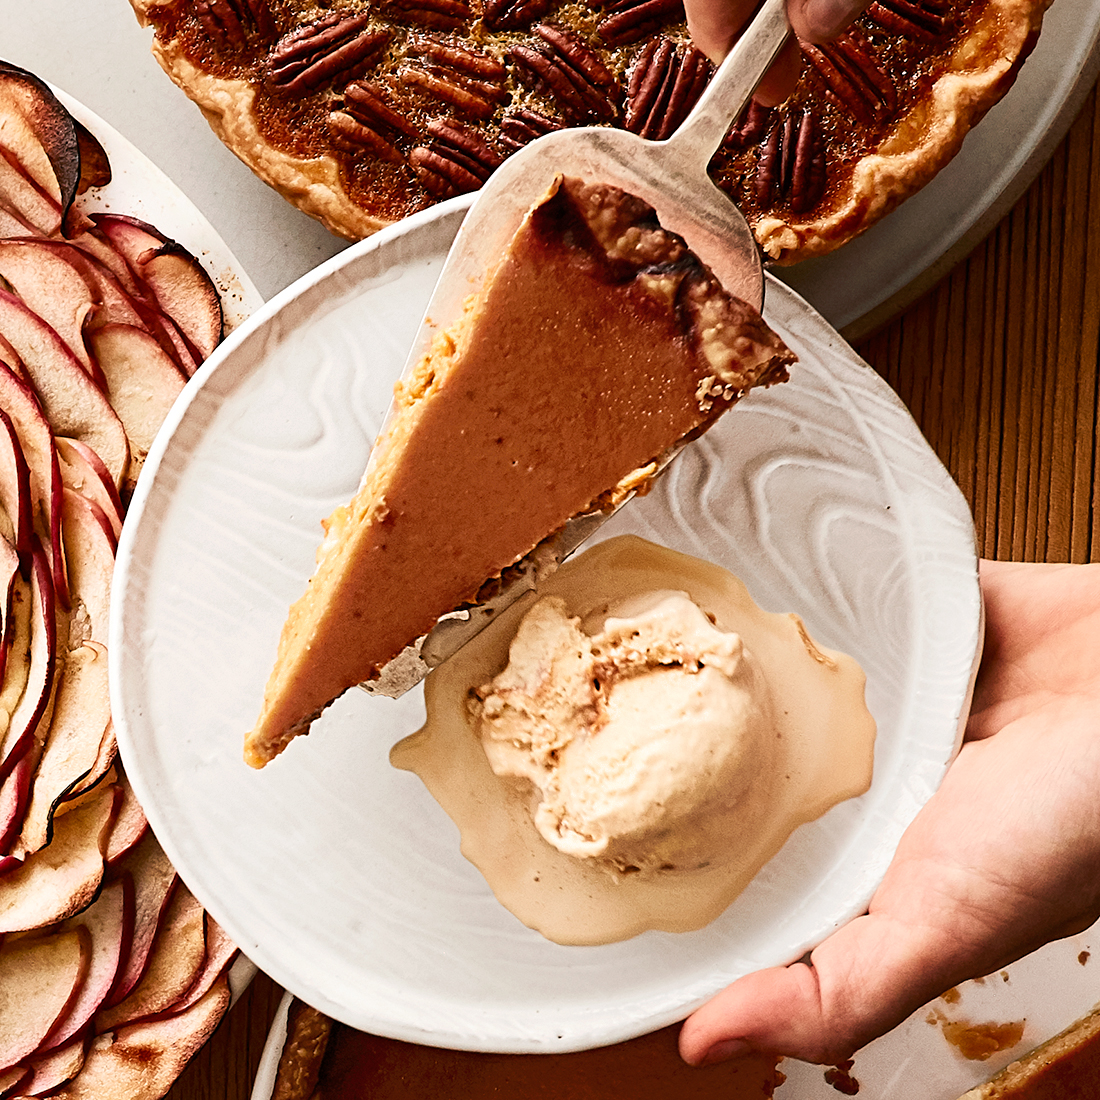 dishing pumpkin pie onto plate